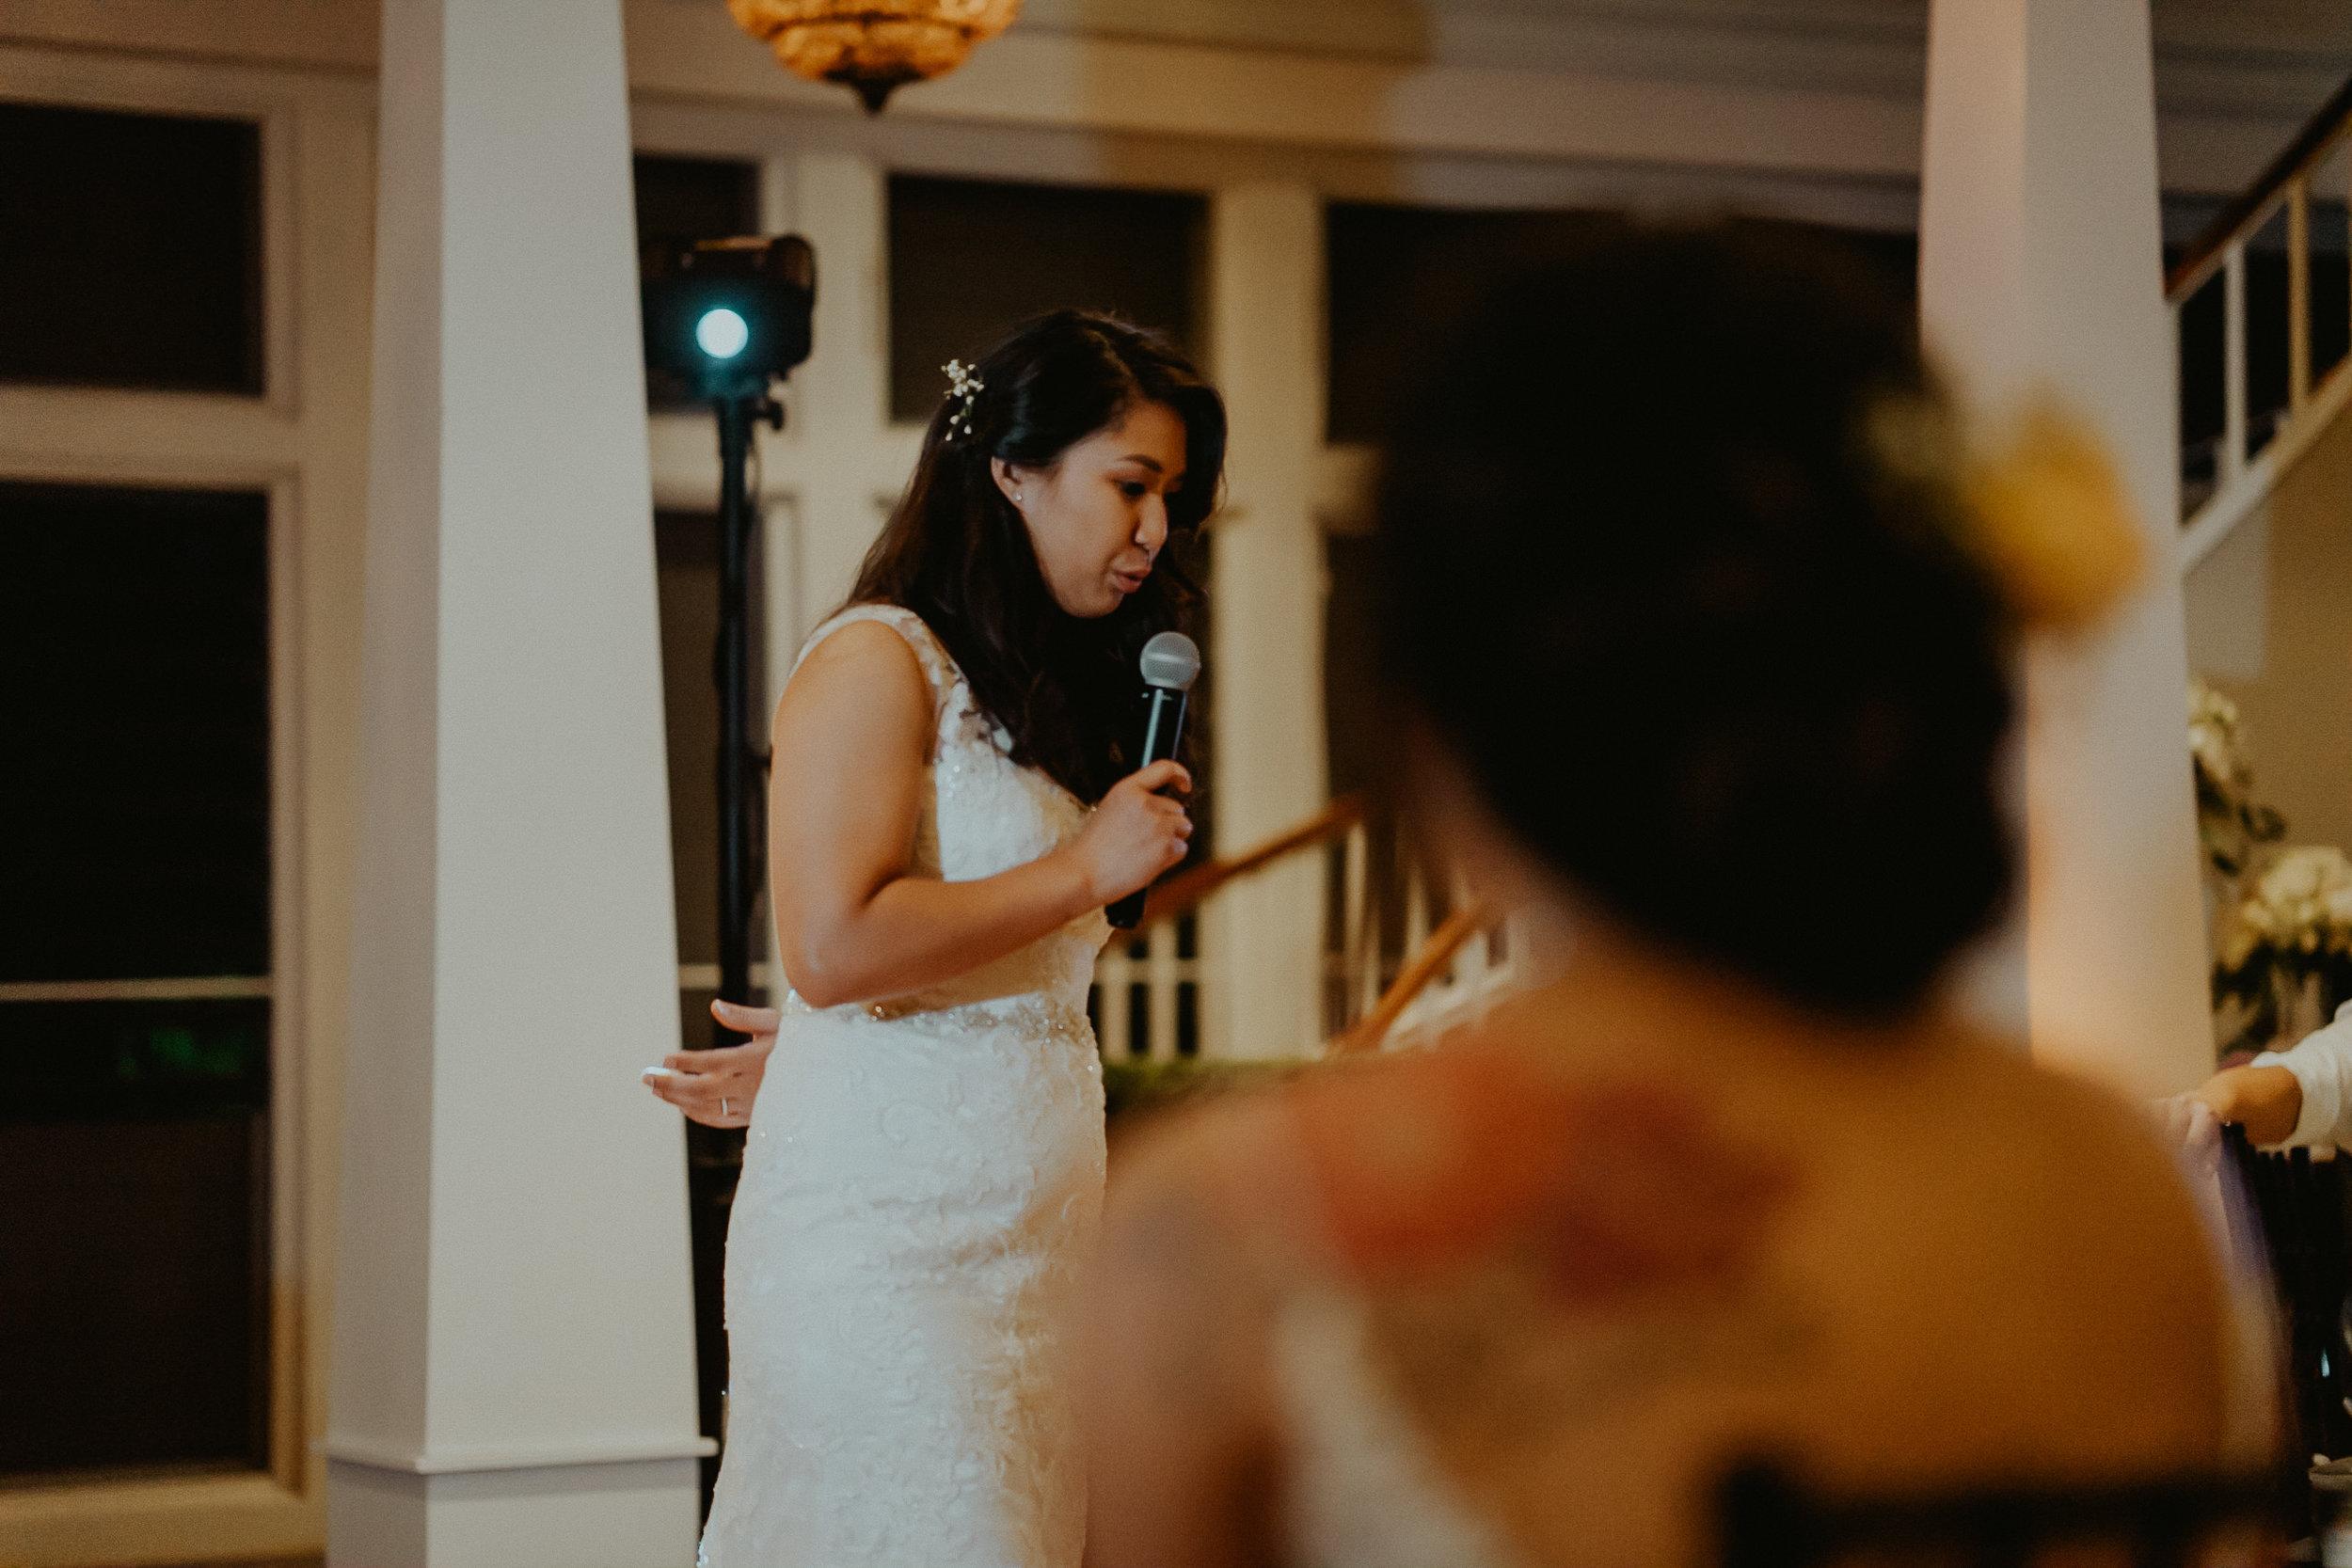 Maui_Destination_wedding_Alfred_Tang-70.jpg